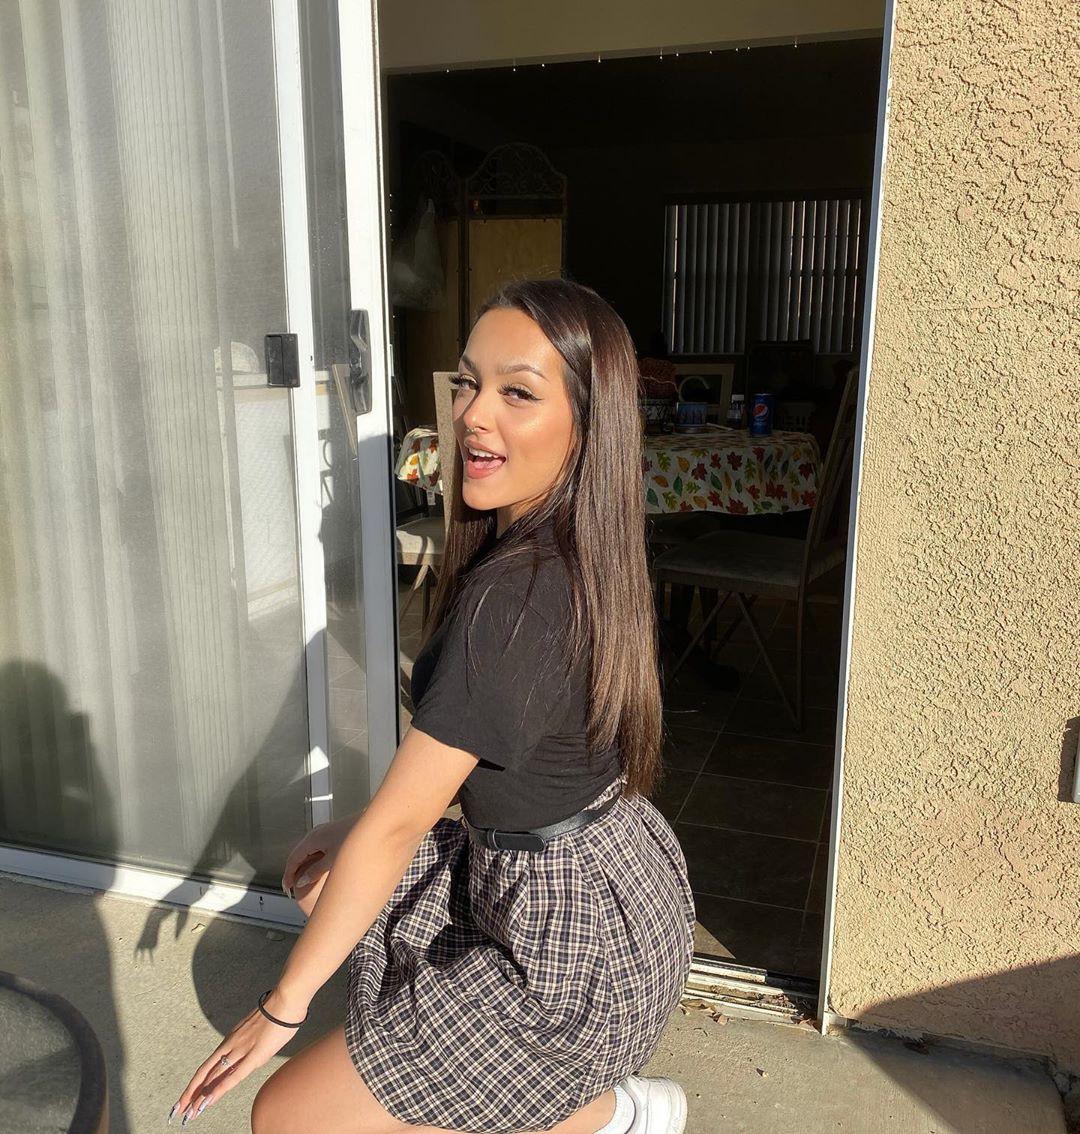 Hailey Orona cute girls photos, hot legs girls, sexy legs